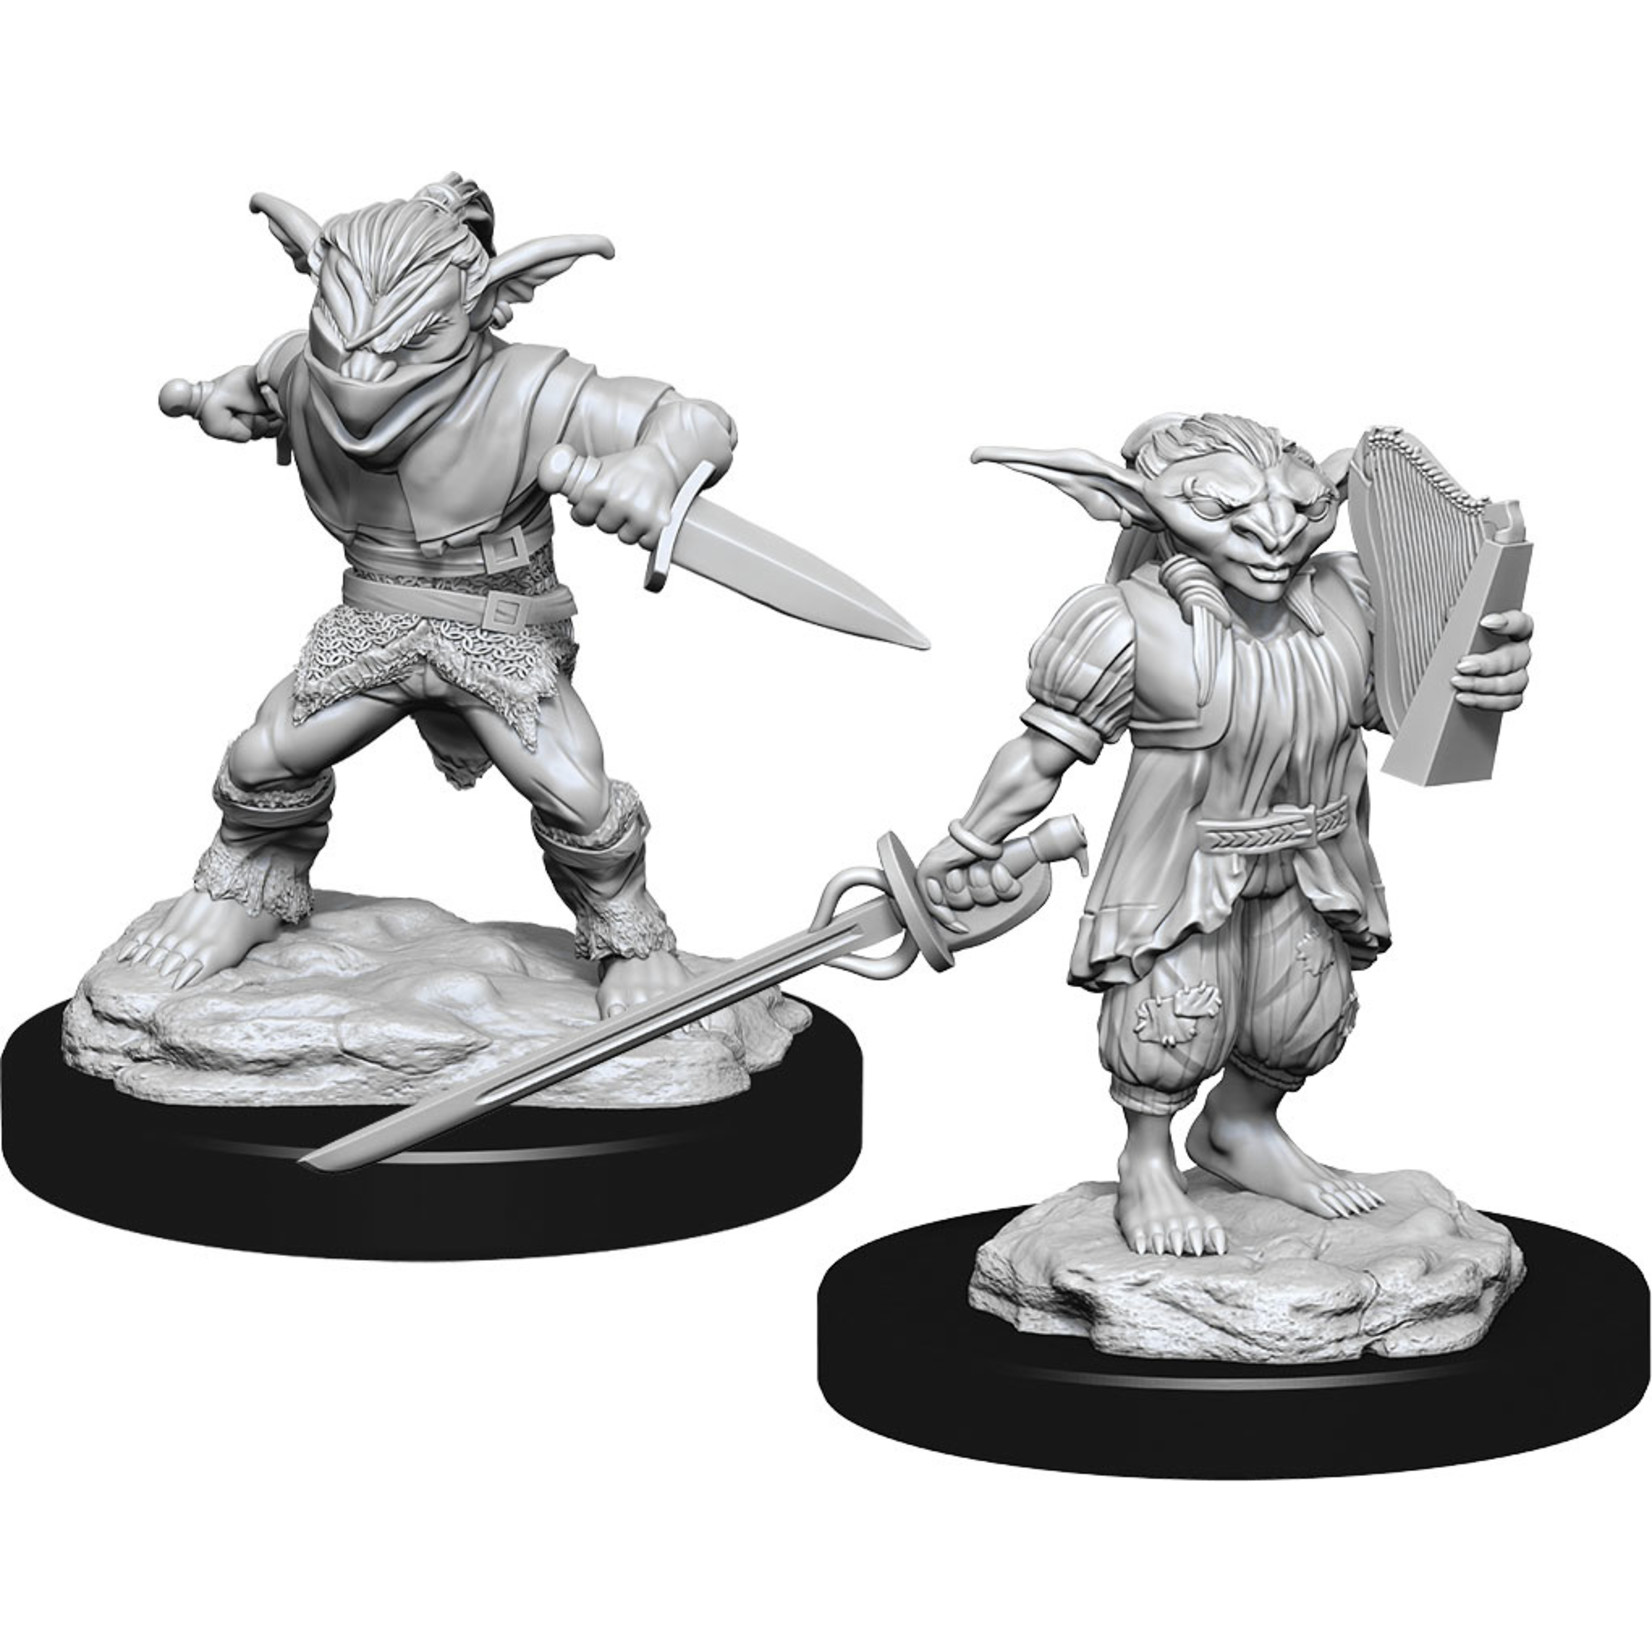 Dungeons & Dragons Nolzur`s Marvelous W15 Male Goblin Rogue & Female Goblin Bard